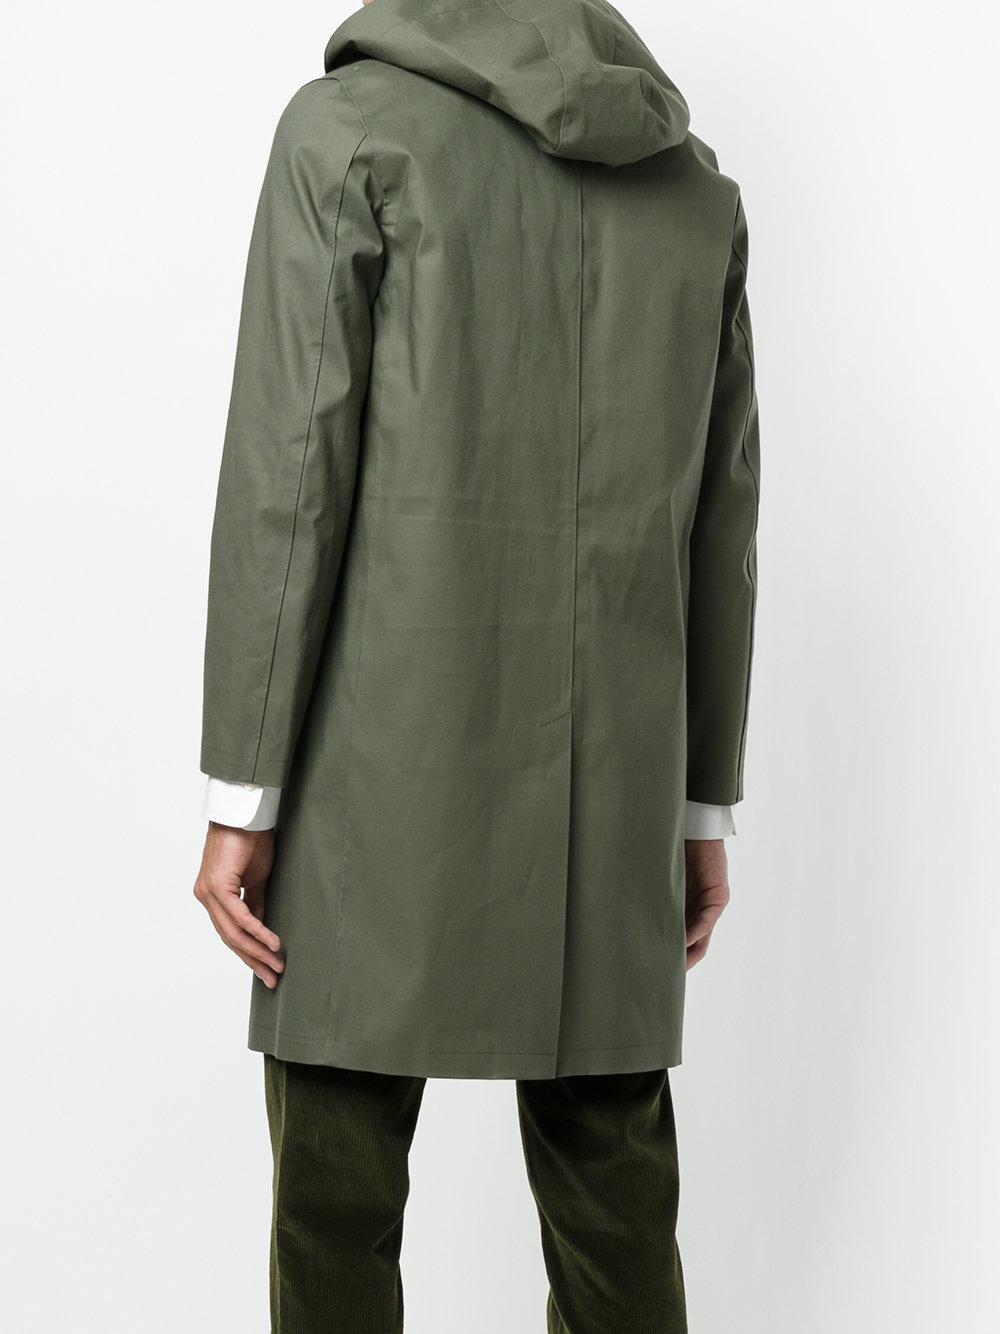 Mackintosh Hooded Raincoat in Green for Men - Lyst